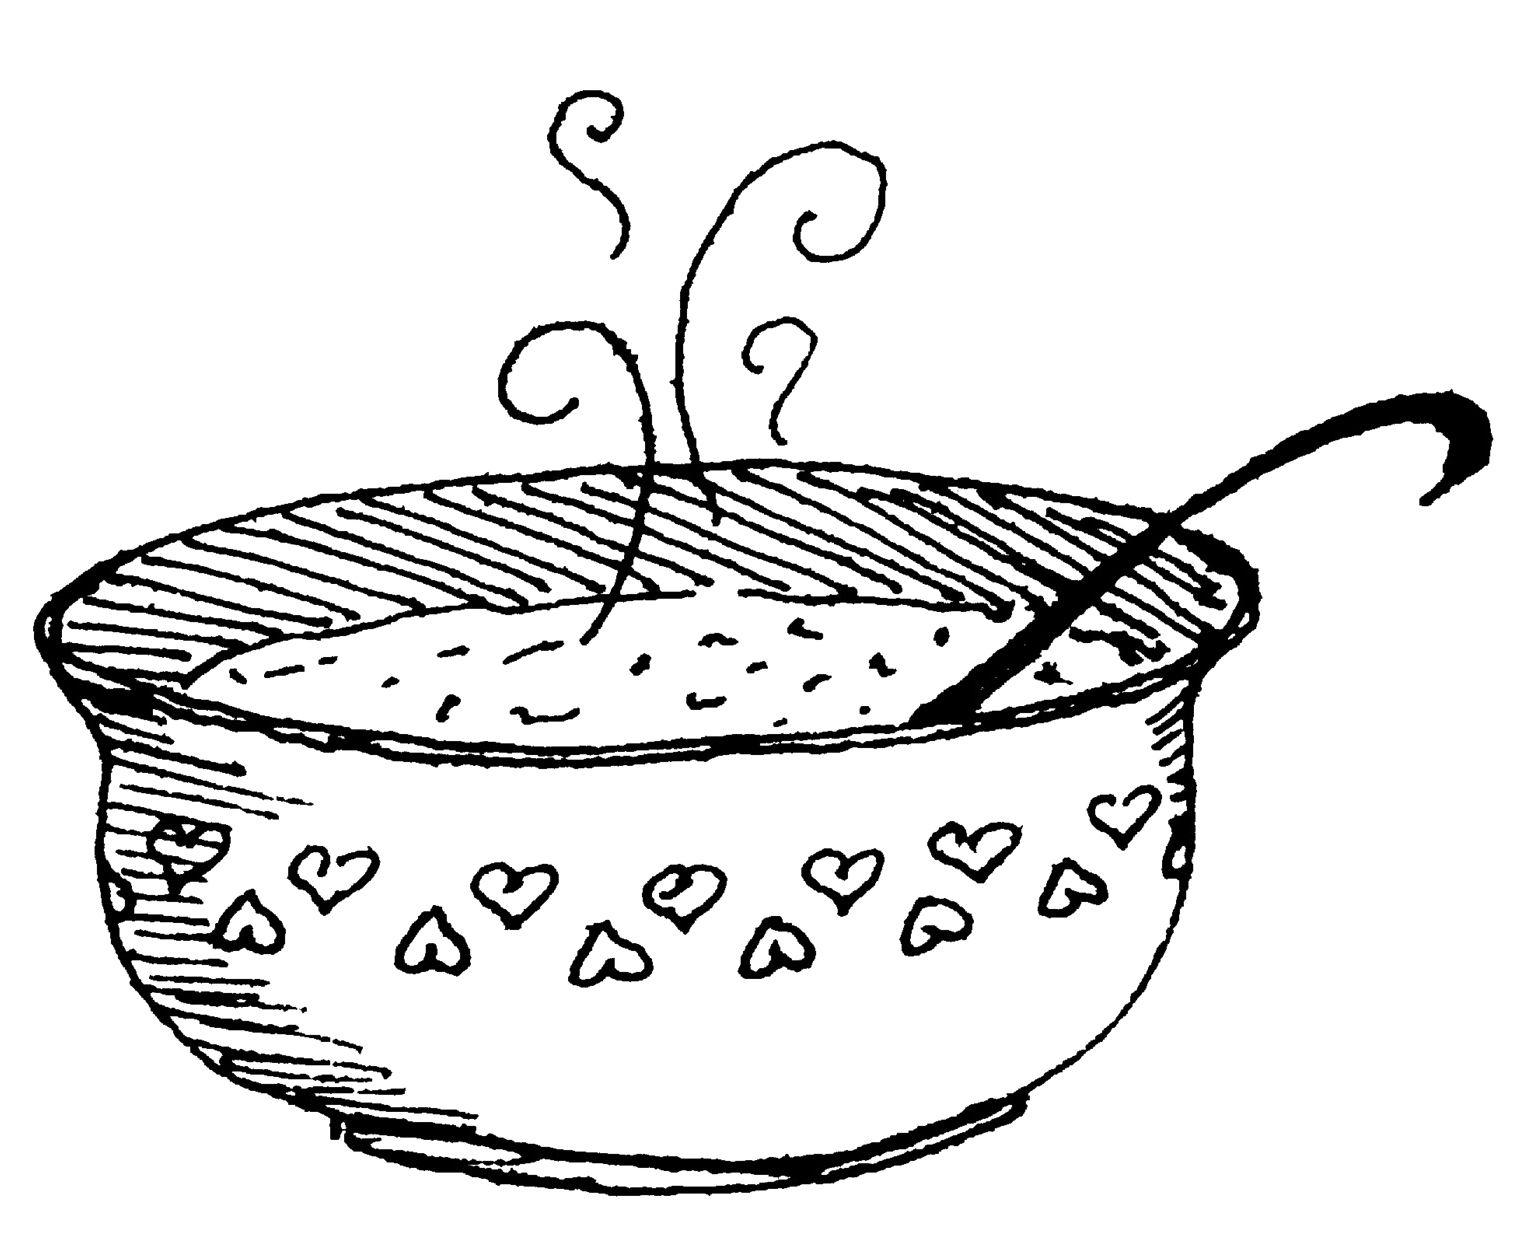 Soup Bowl Coloring Pages Wildreissuppe Essen Grafiken